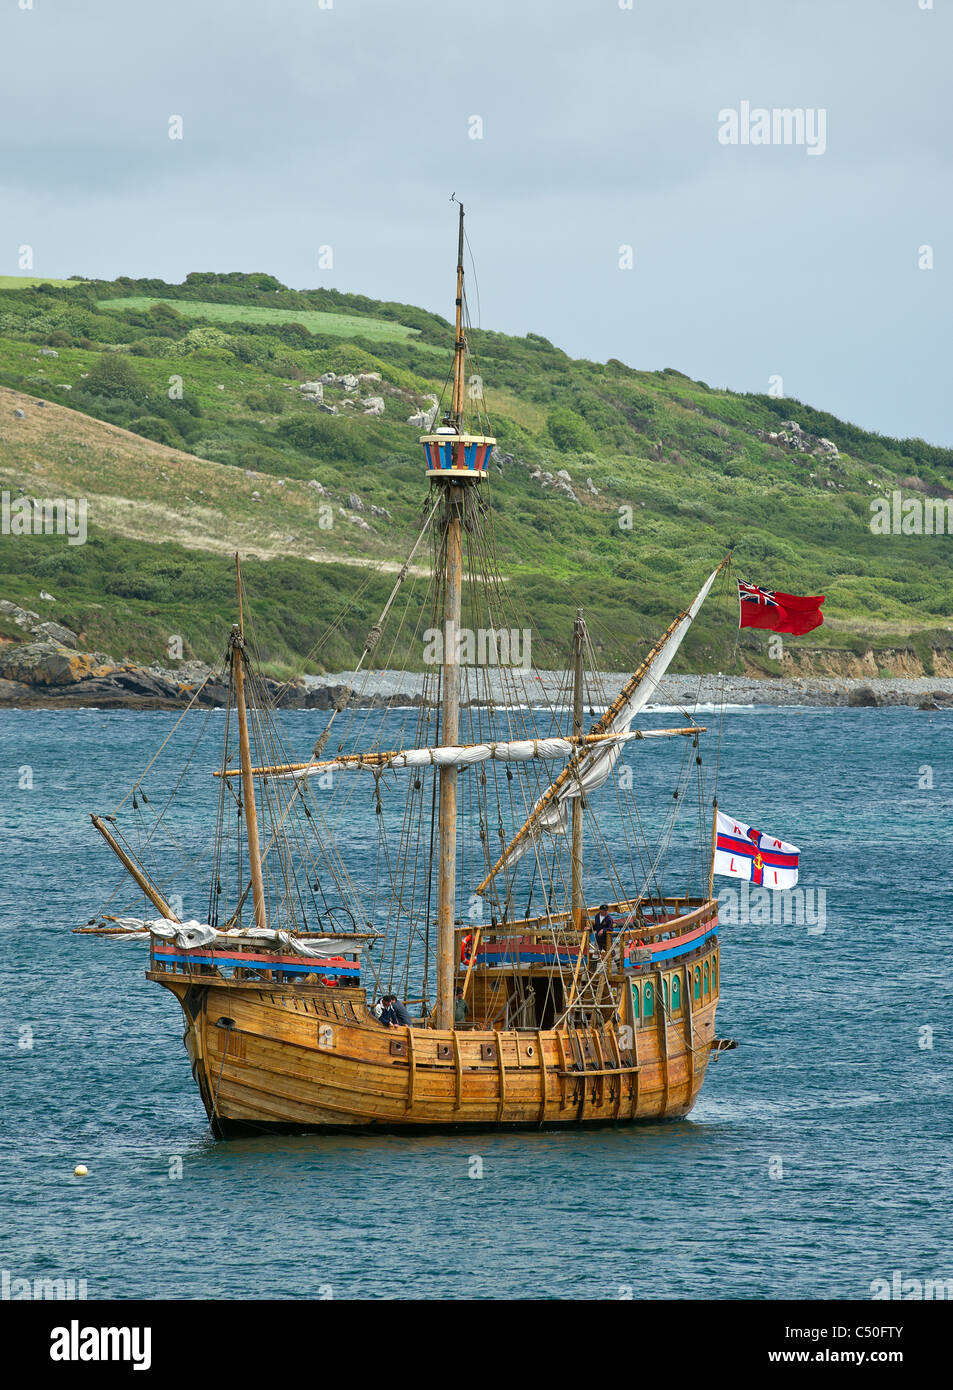 The Matthew, a replica of John Cabots ship - Stock Image